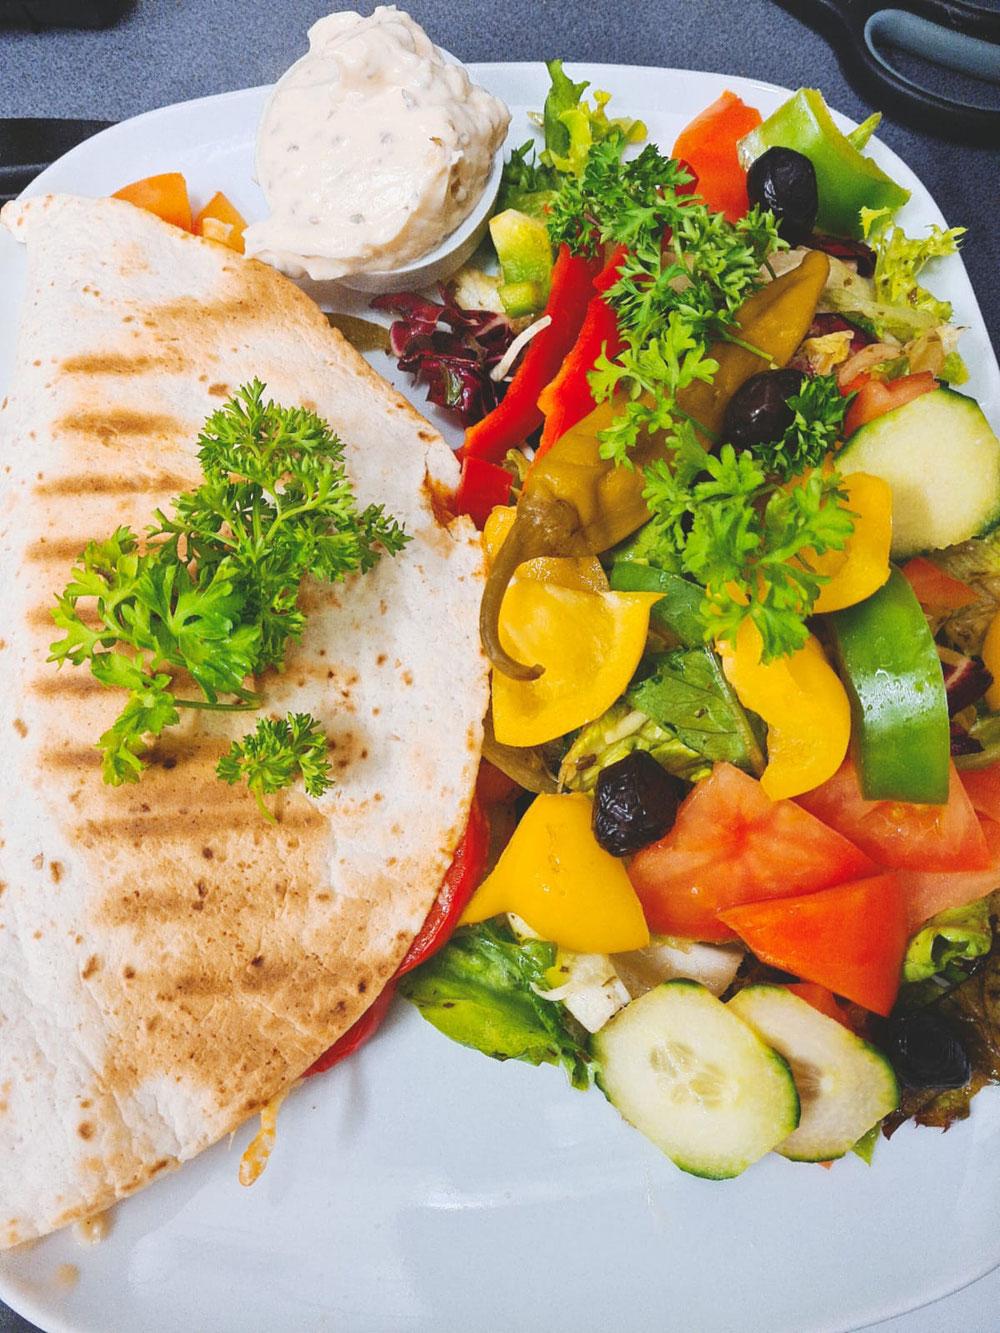 Quesadilla mit Salatbeilage